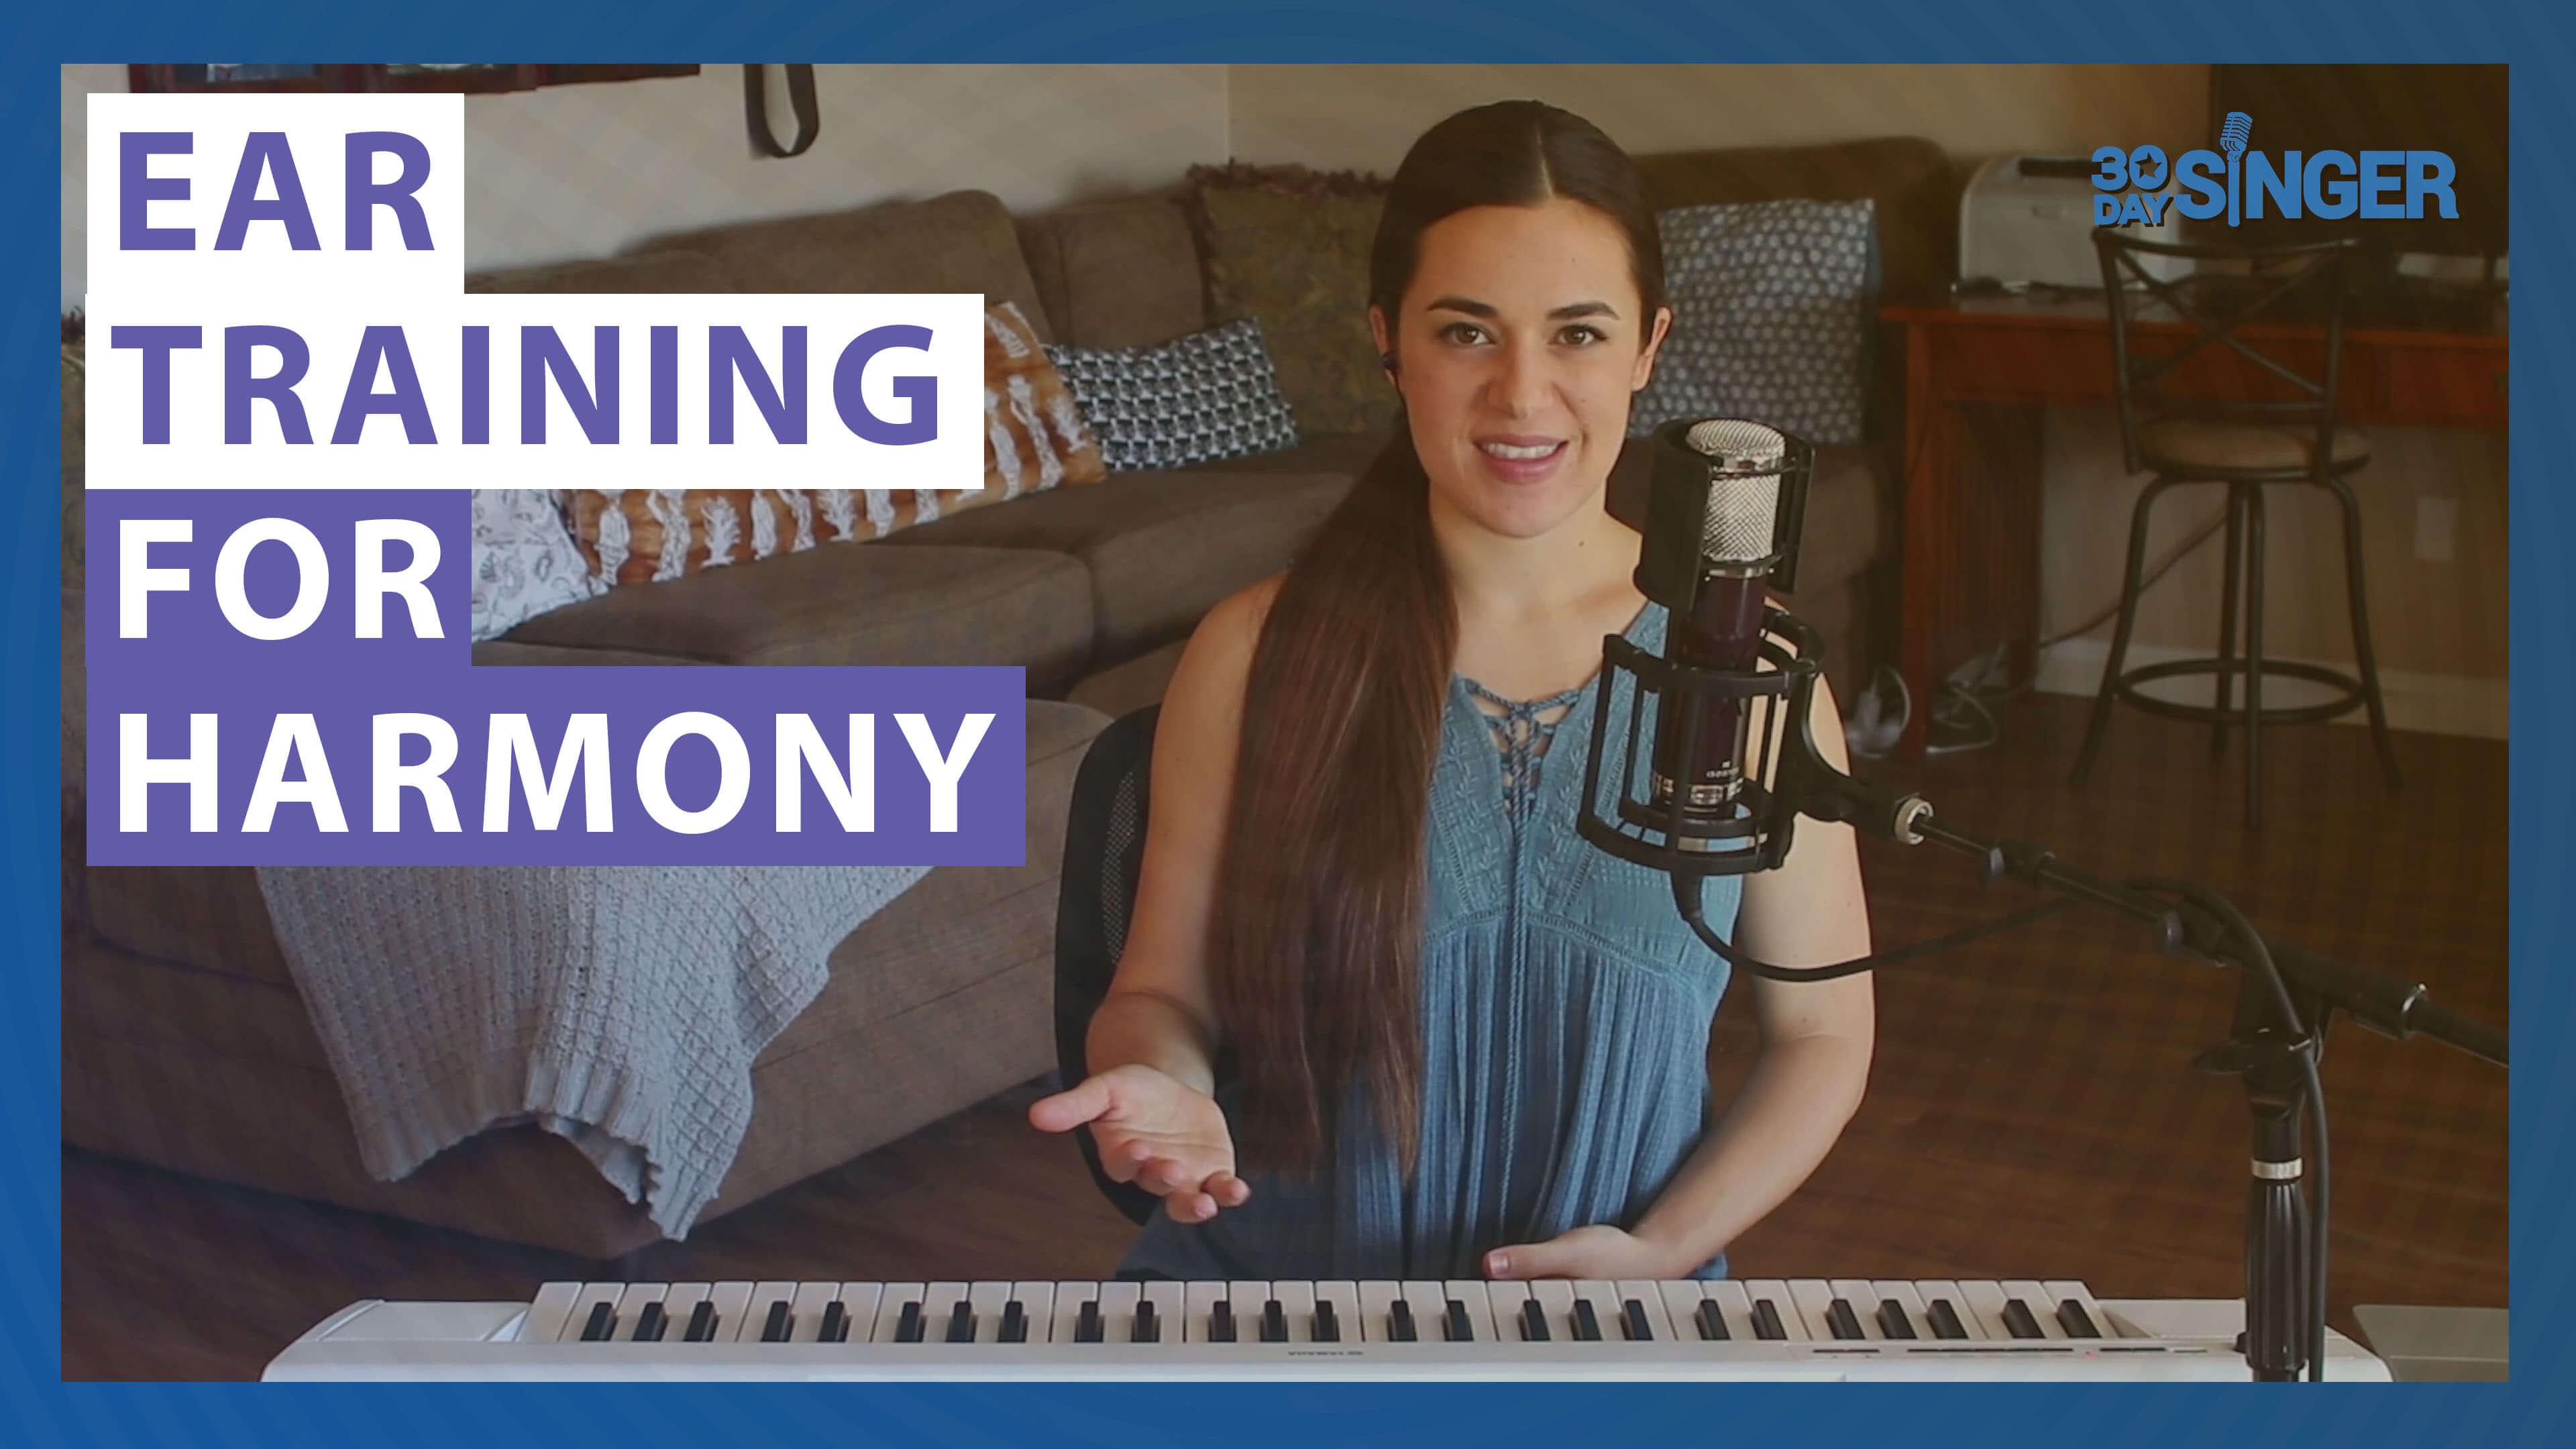 Ear Training for Harmony